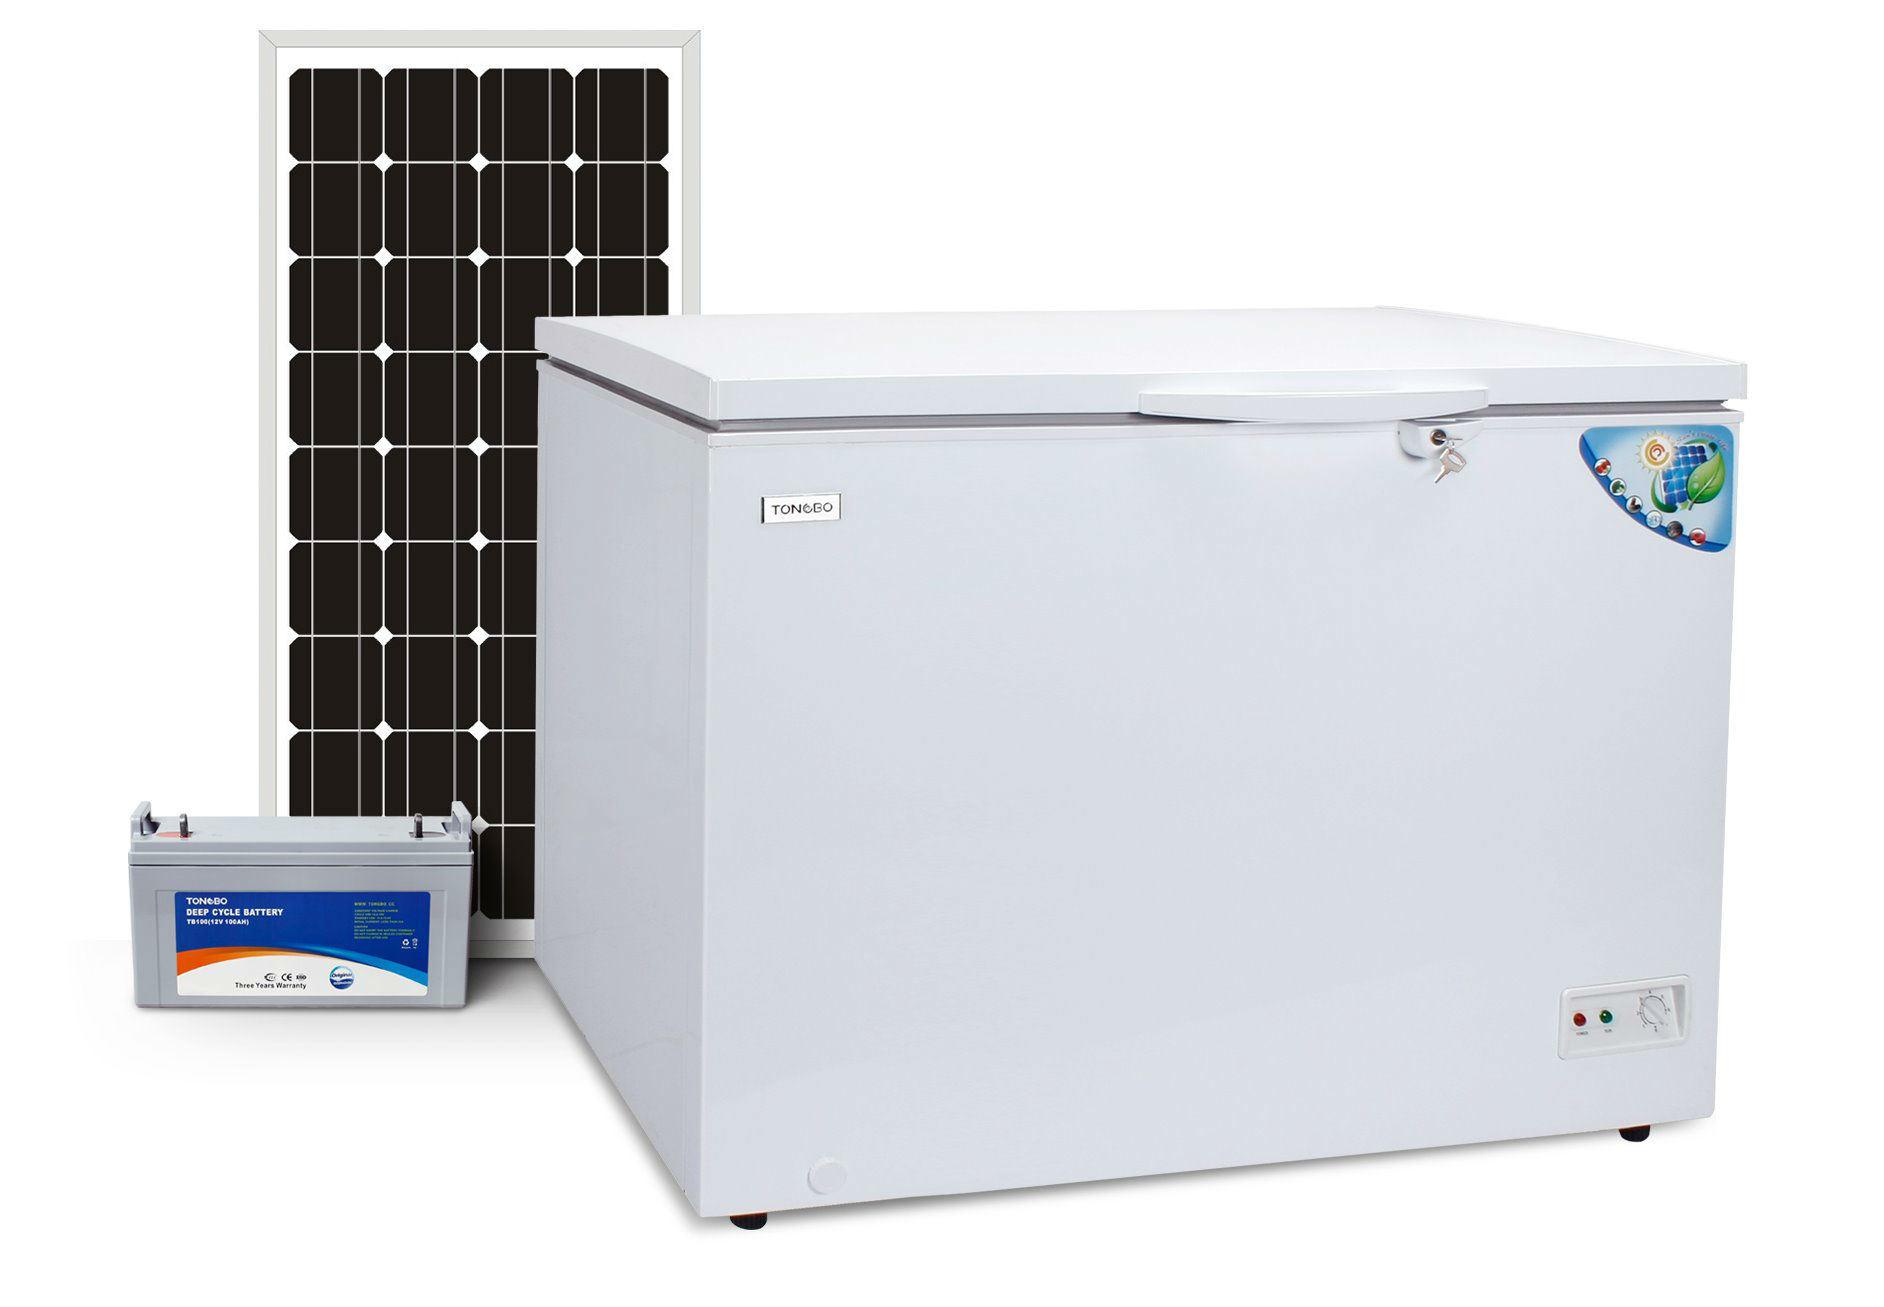 off Grid 100% Solar Powered DC 12V 24V Chest Freezer 282L